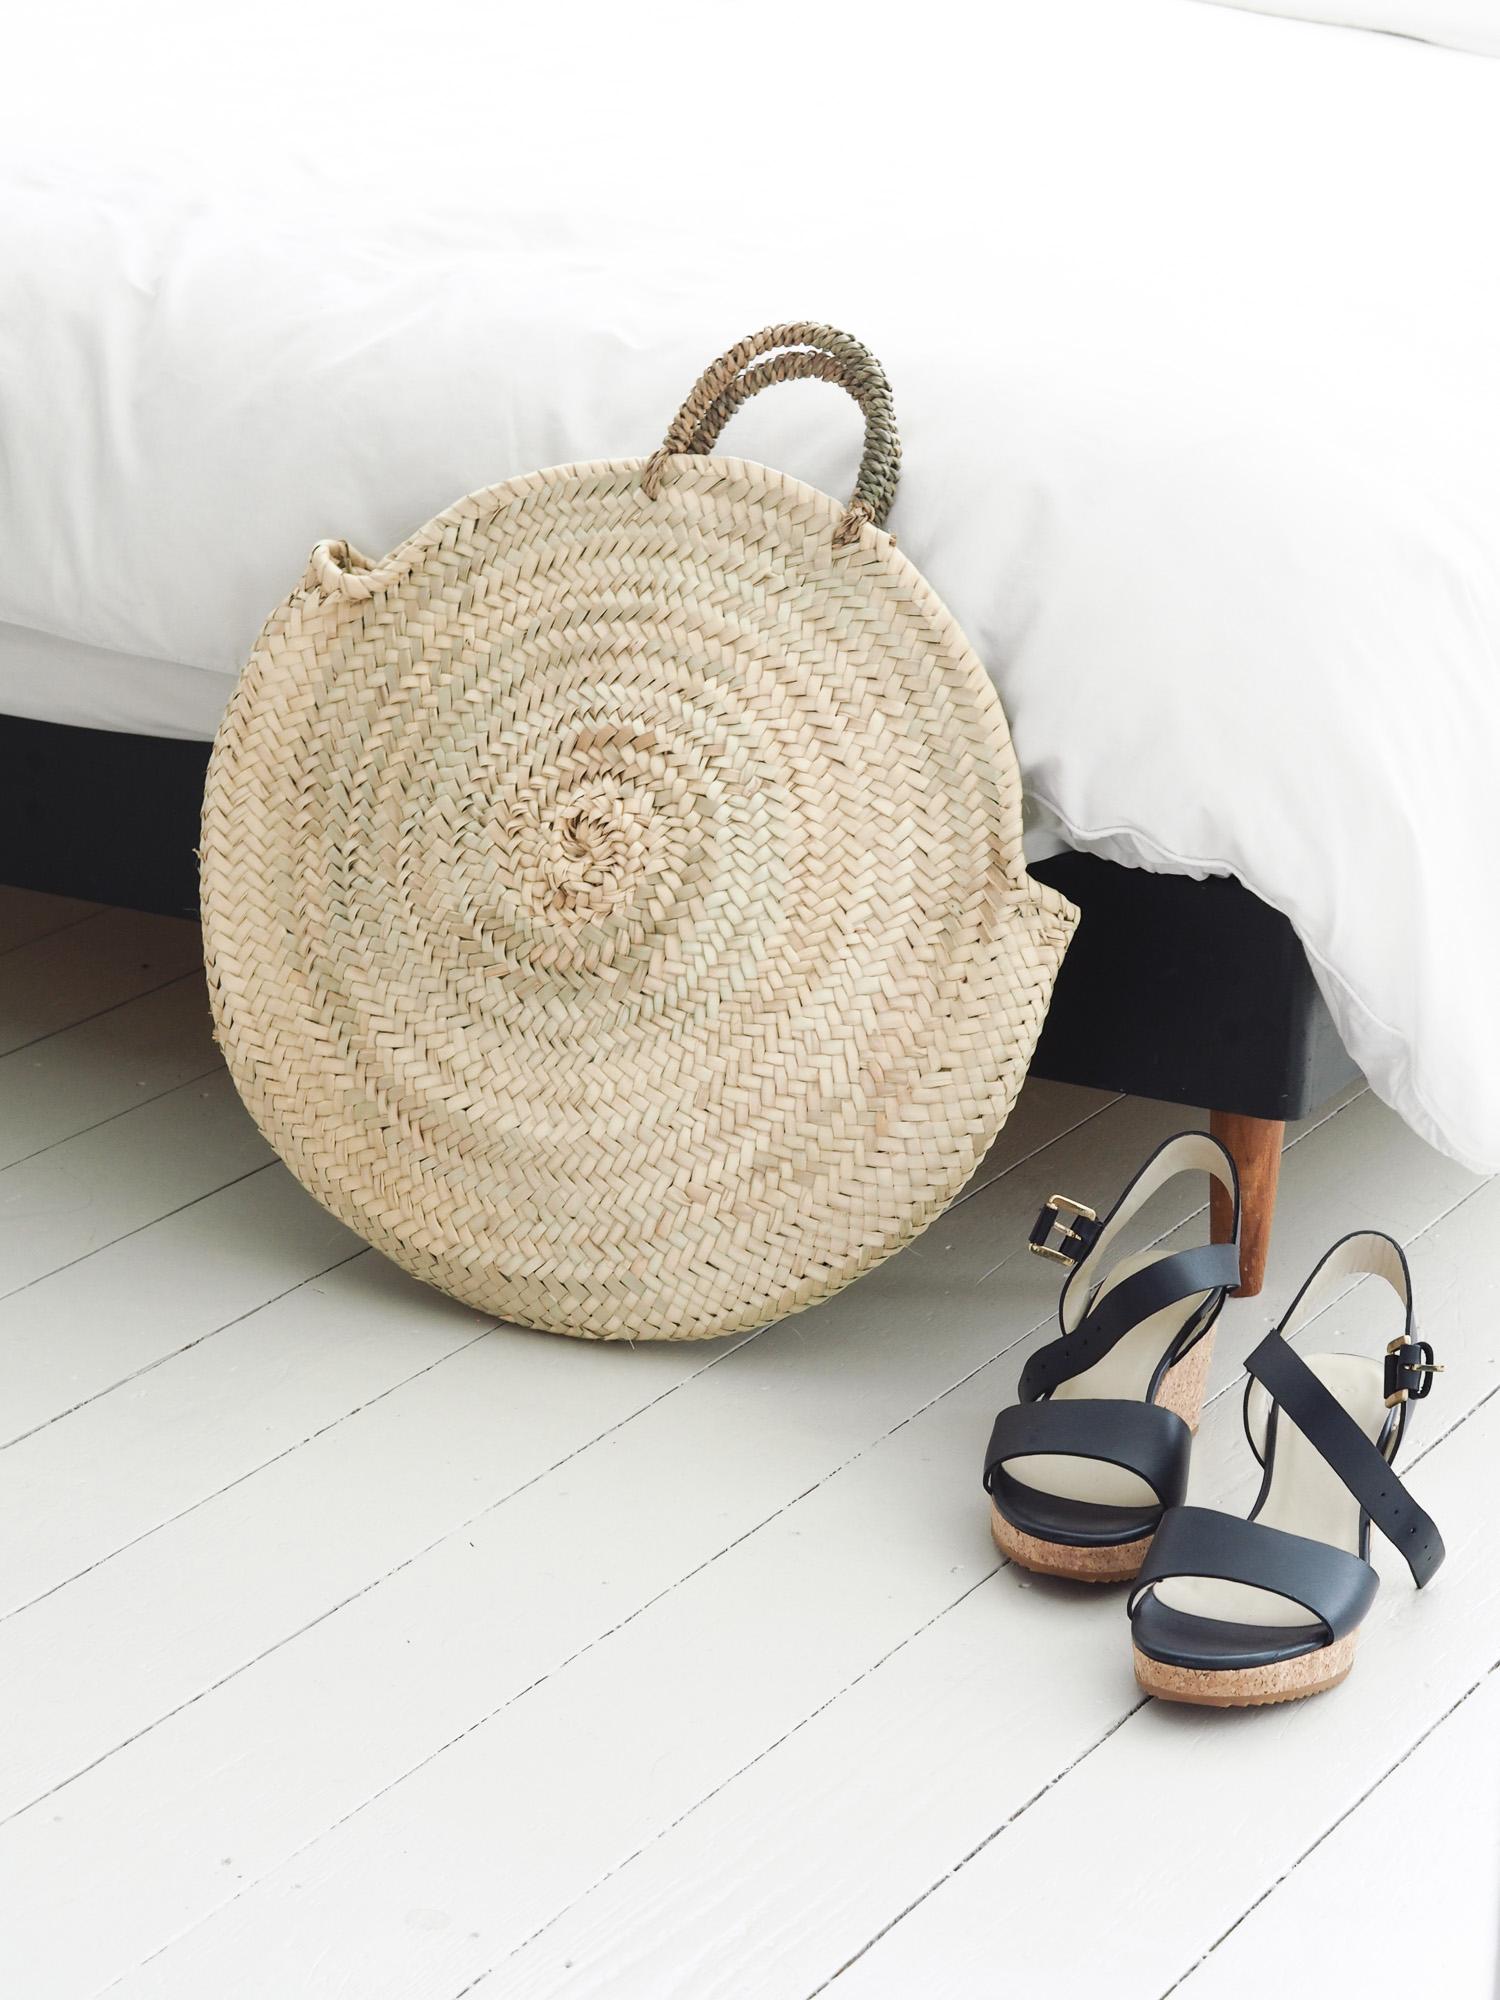 Straw basket and wedge sandals | Design Hunter